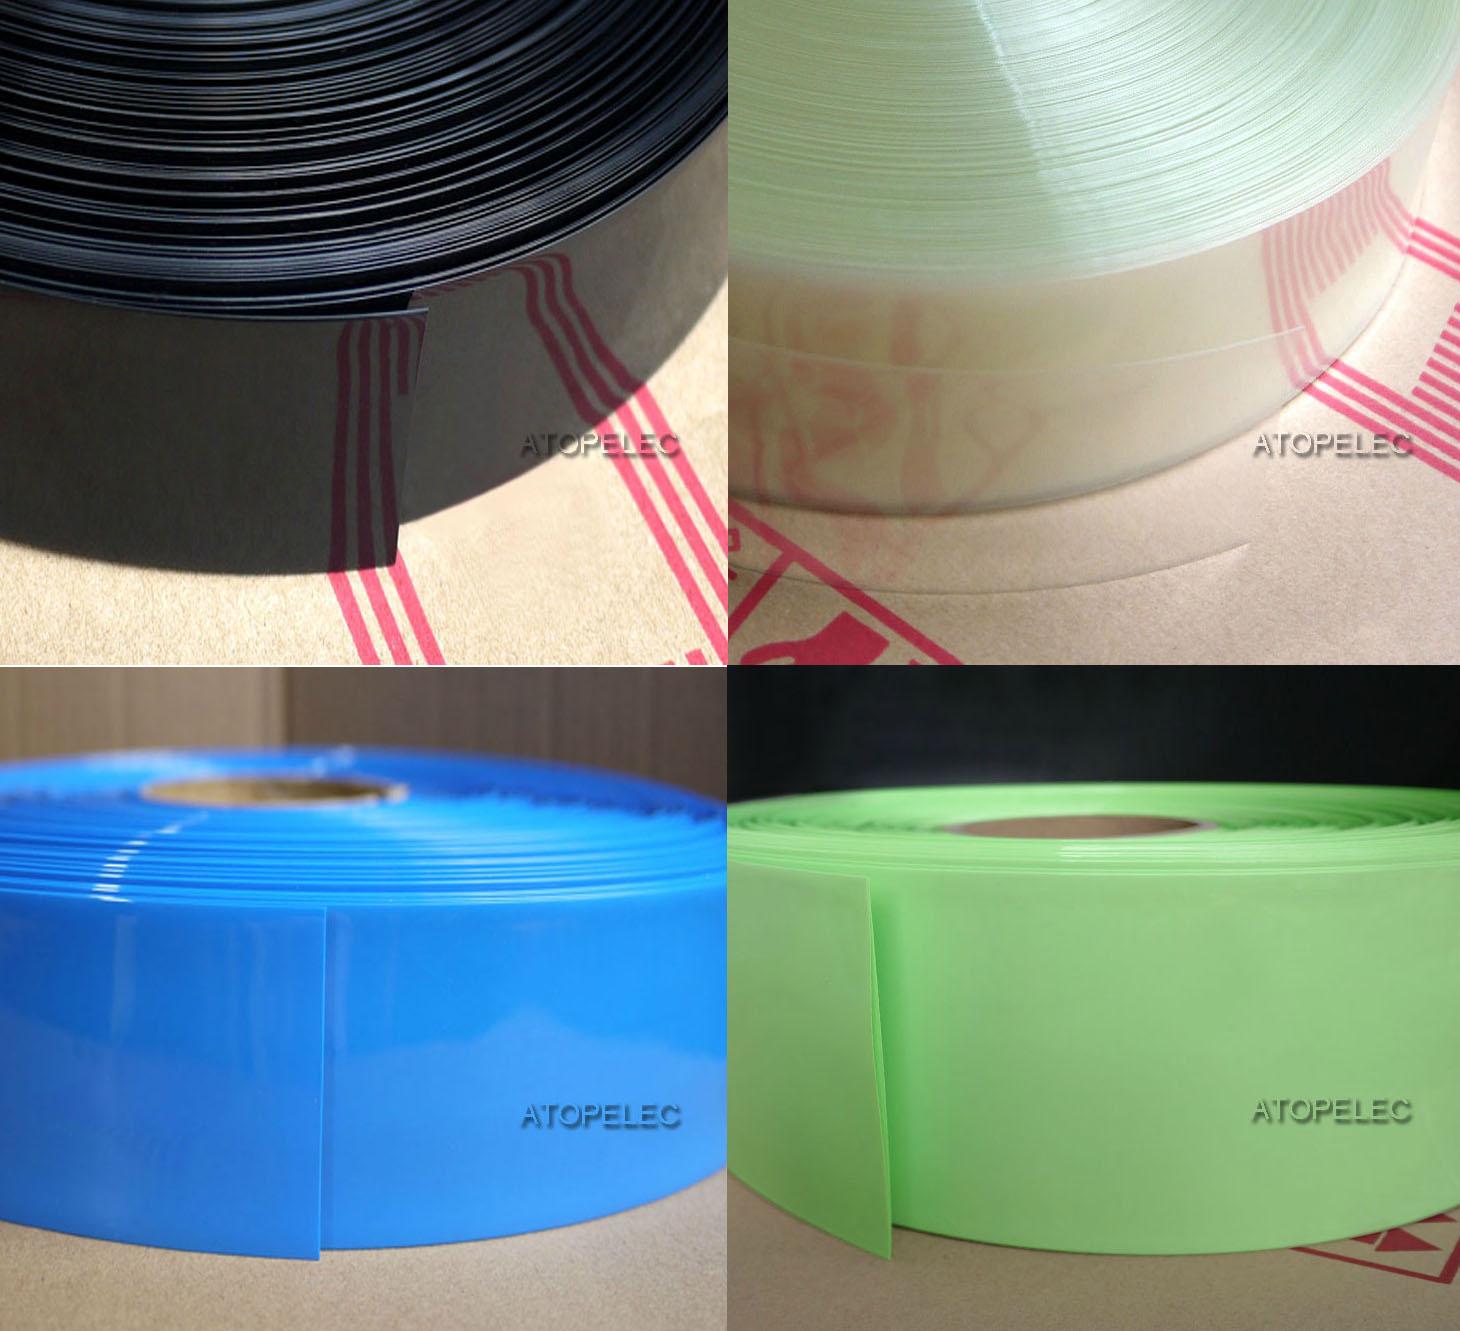 sourcingmap Heat Shrink Tubing 15mm Dia 25mm Flat Width 2:1 Heat Shrink Wrap Cable Sleeve Heatshrink Tube 5m Red